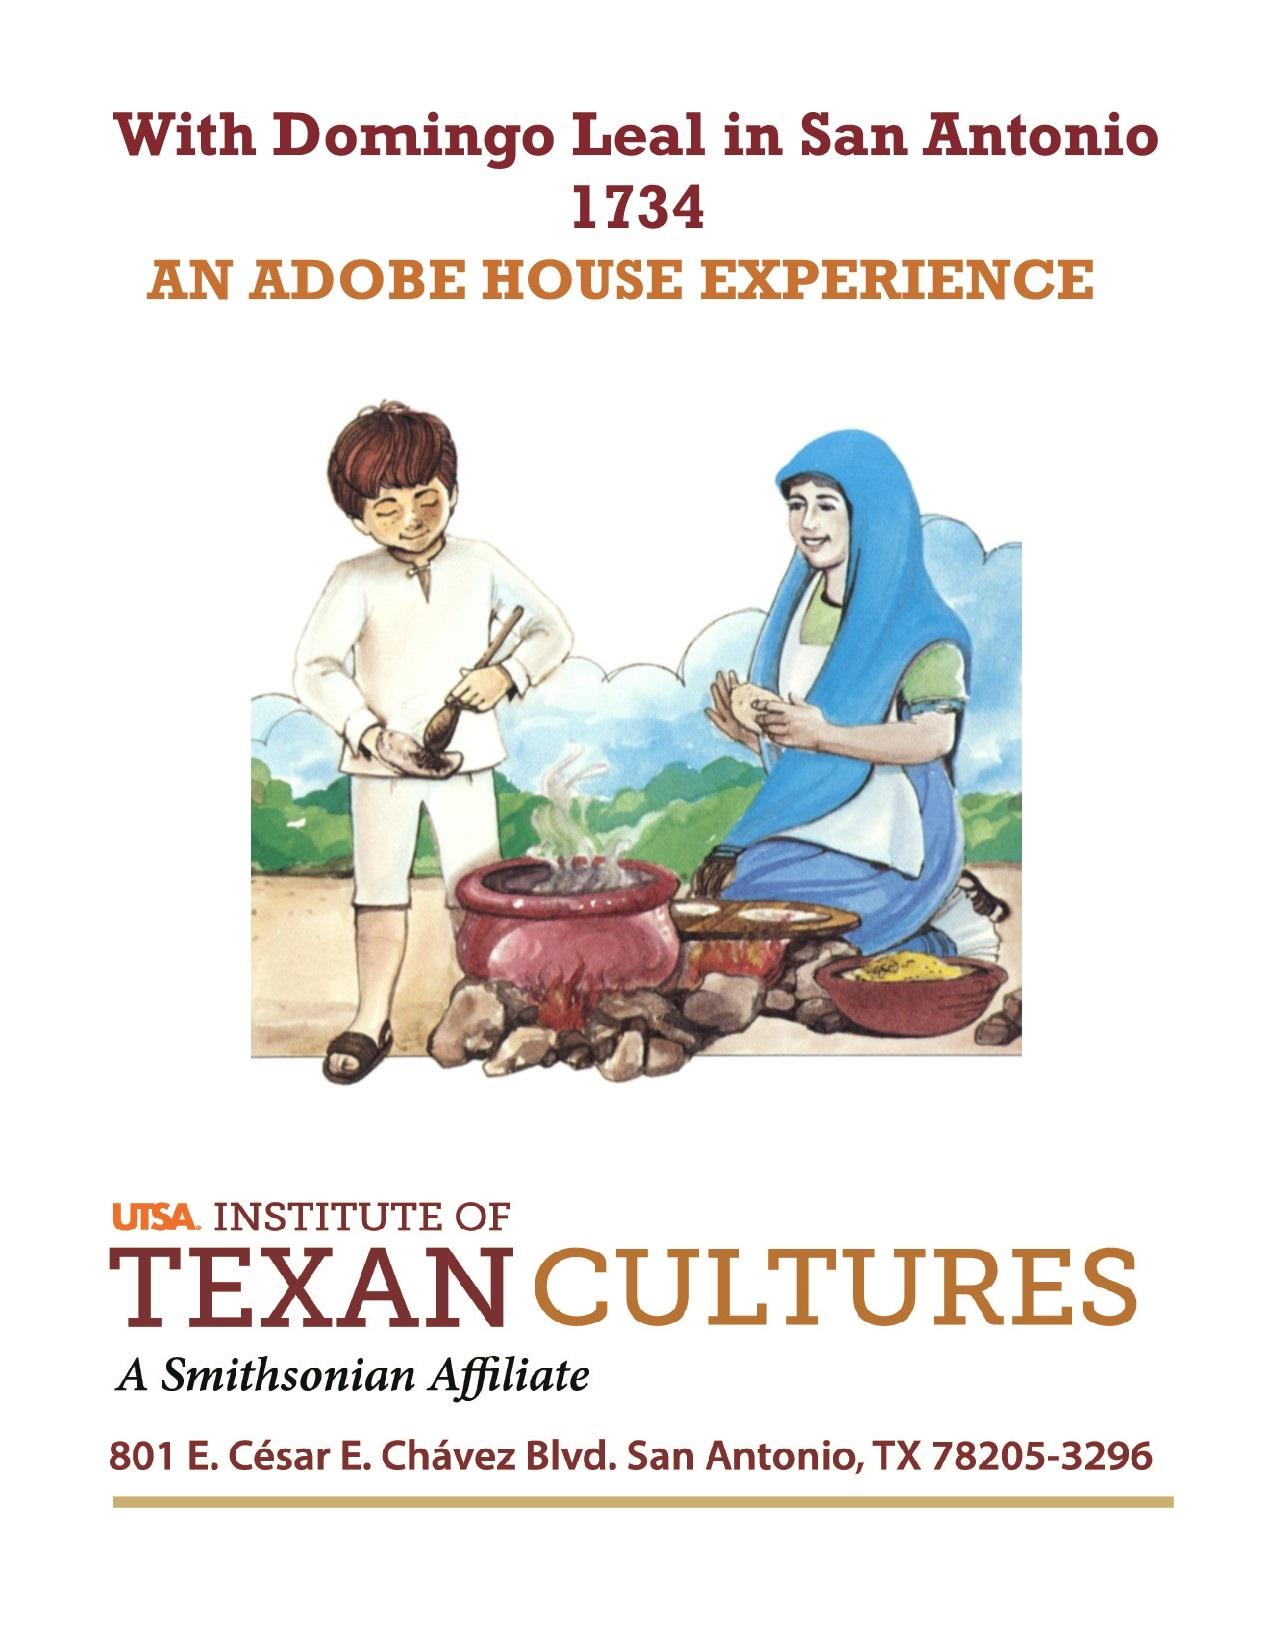 With Domingo Leal in San Antonio, 1734 | UTSA Institute Of Texan Cultures